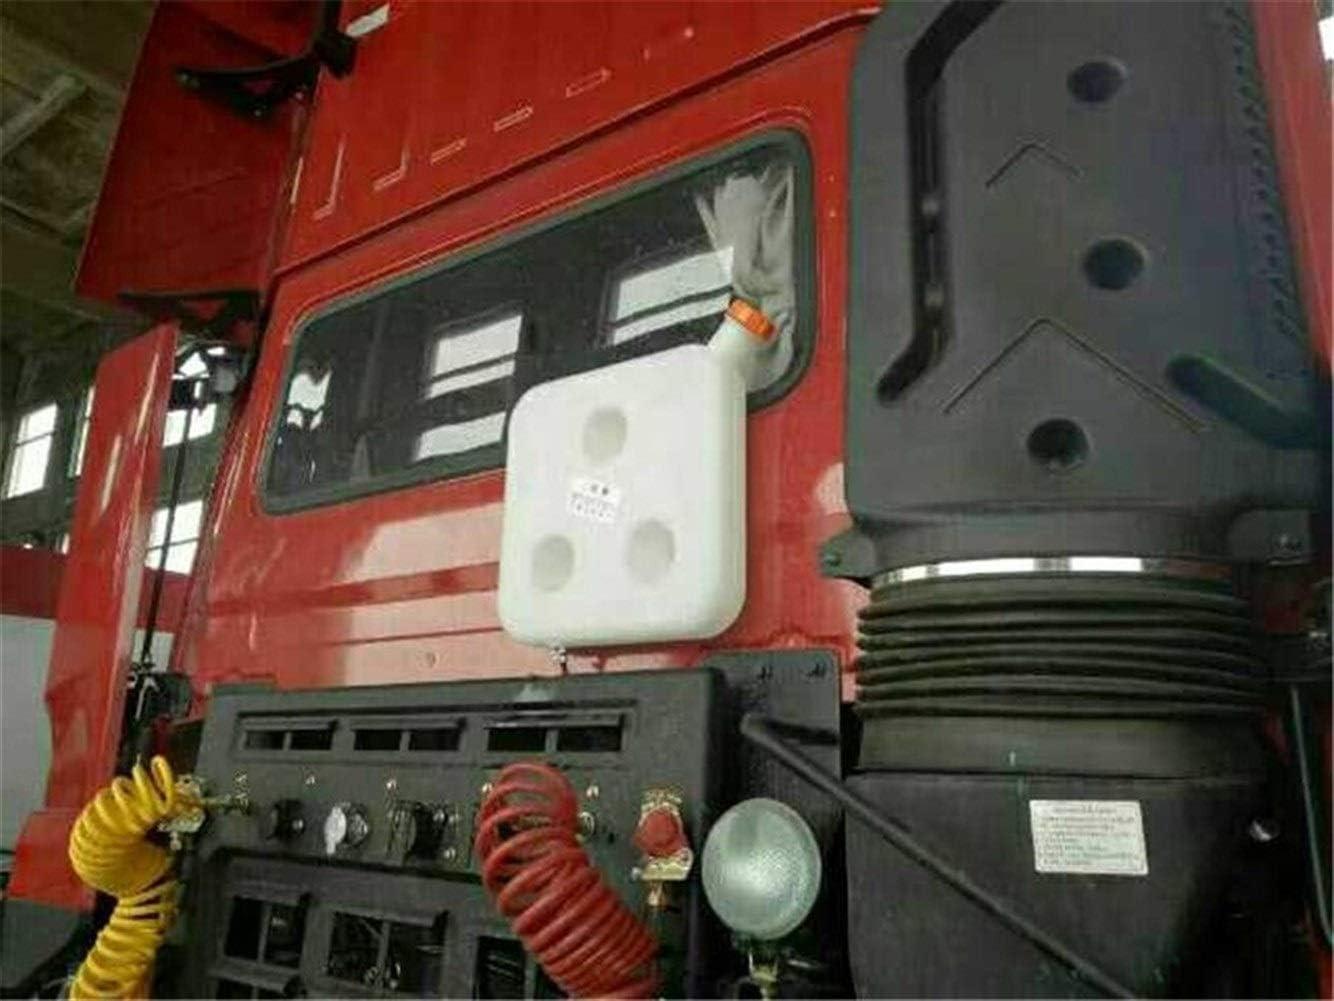 Color : White Serbatoio di carburante Benzina Serbatoio carburante Oil Engineering Plastic Benzin Serbatoio for Webasto Eberspacher Aria Diesel Riscaldatore Per conservare lolio